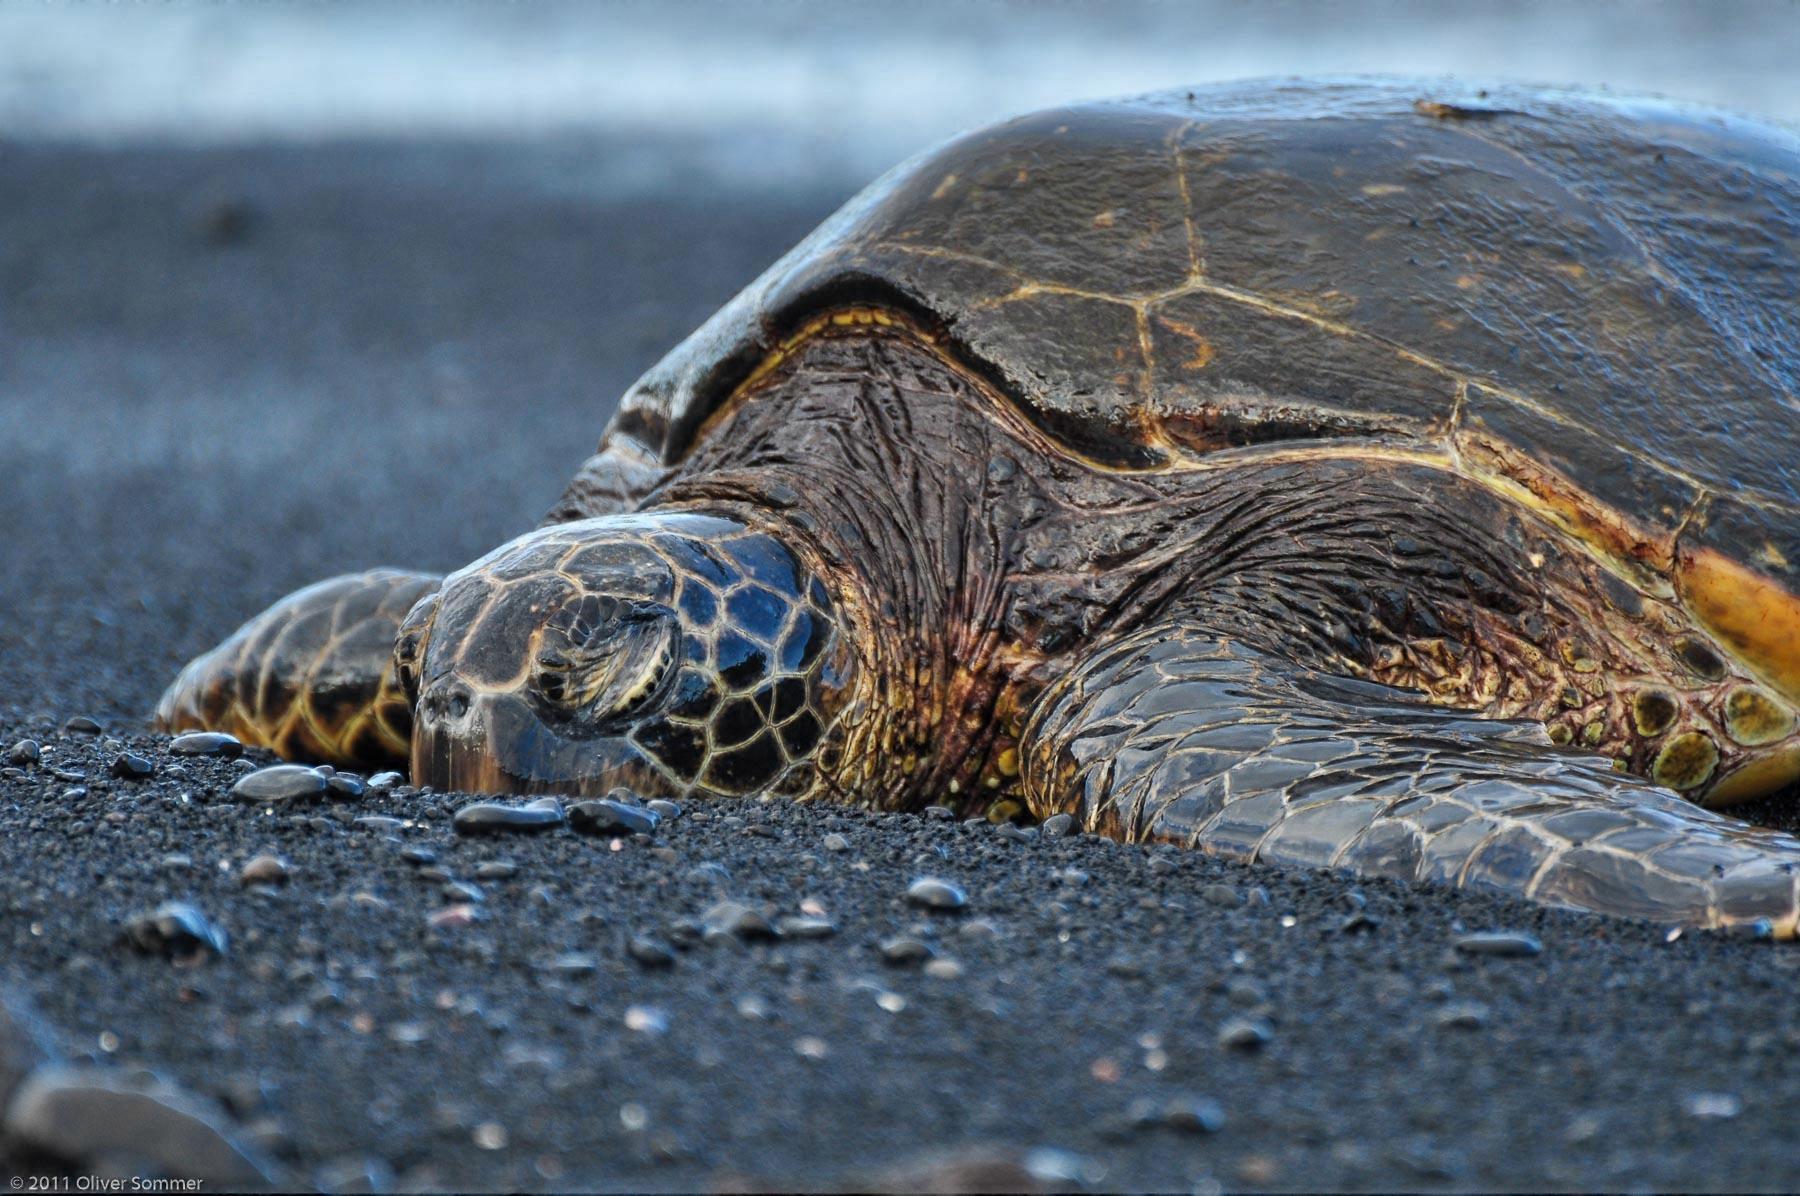 Suppenschildkröte Grüne Meeresschildkröte Chelonia Mydas Punalu'u